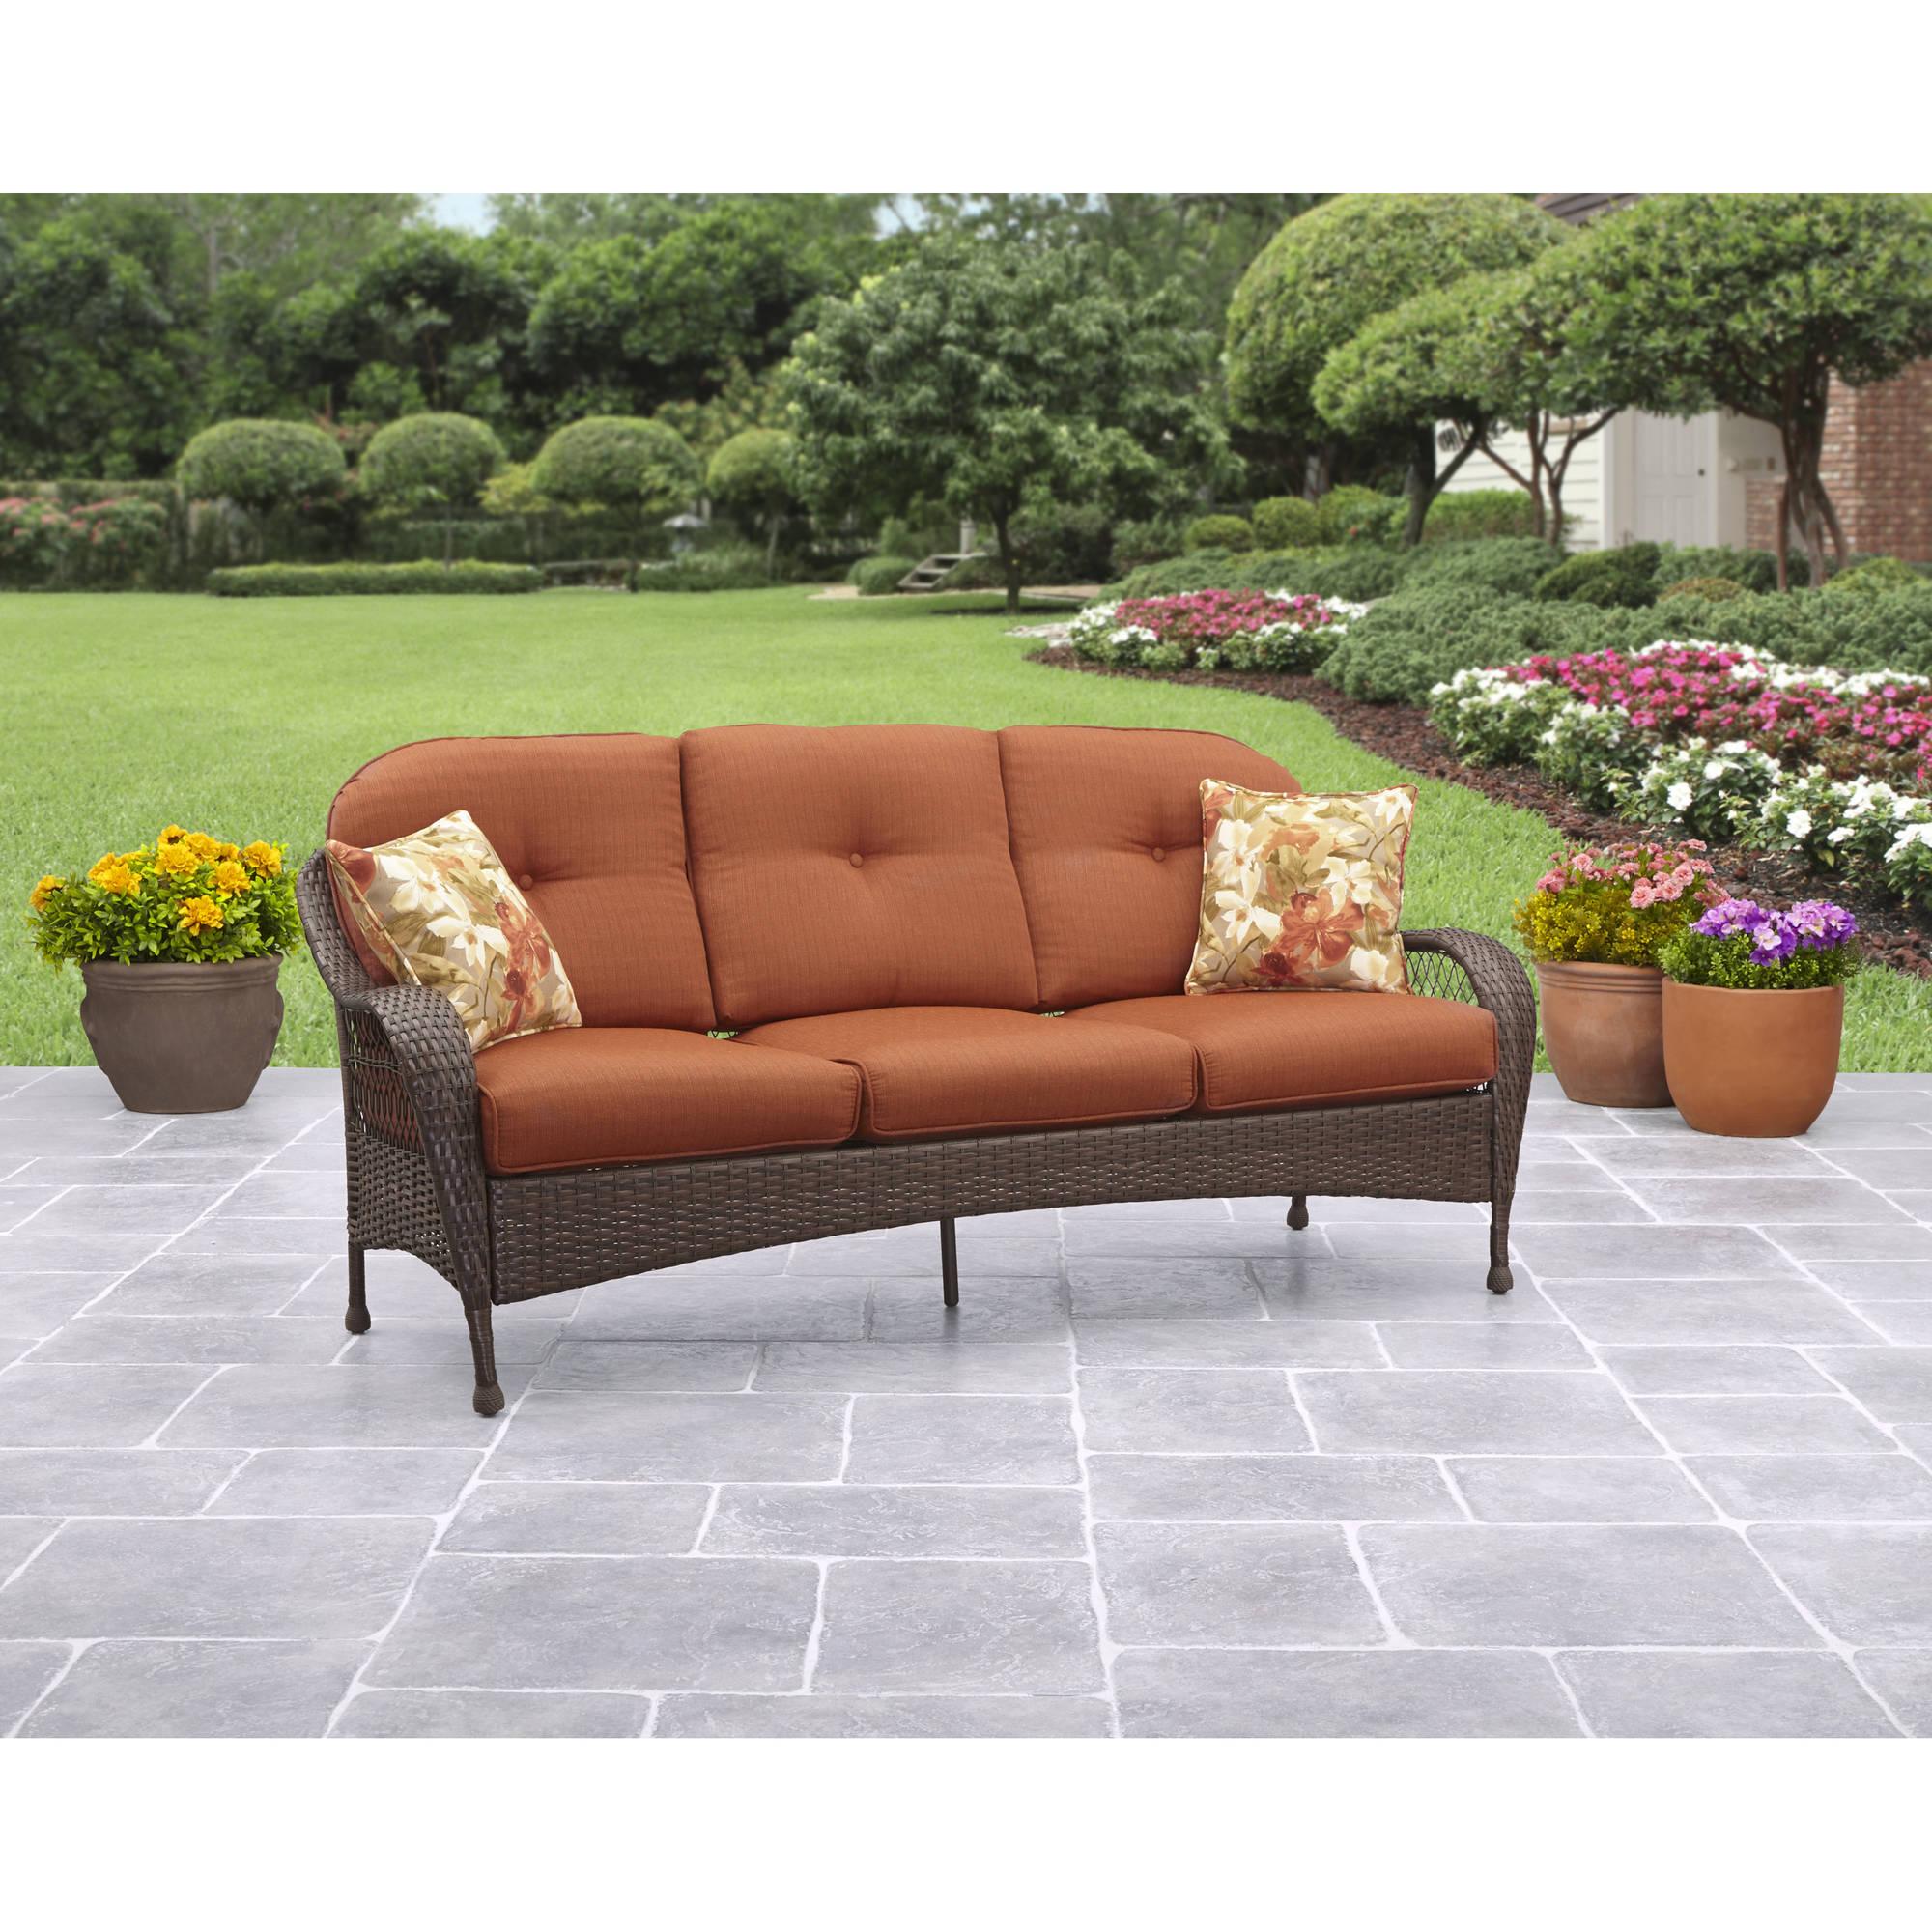 . Better Homes and Gardens Azalea Ridge Outdoor Sofa   Slickdeals net